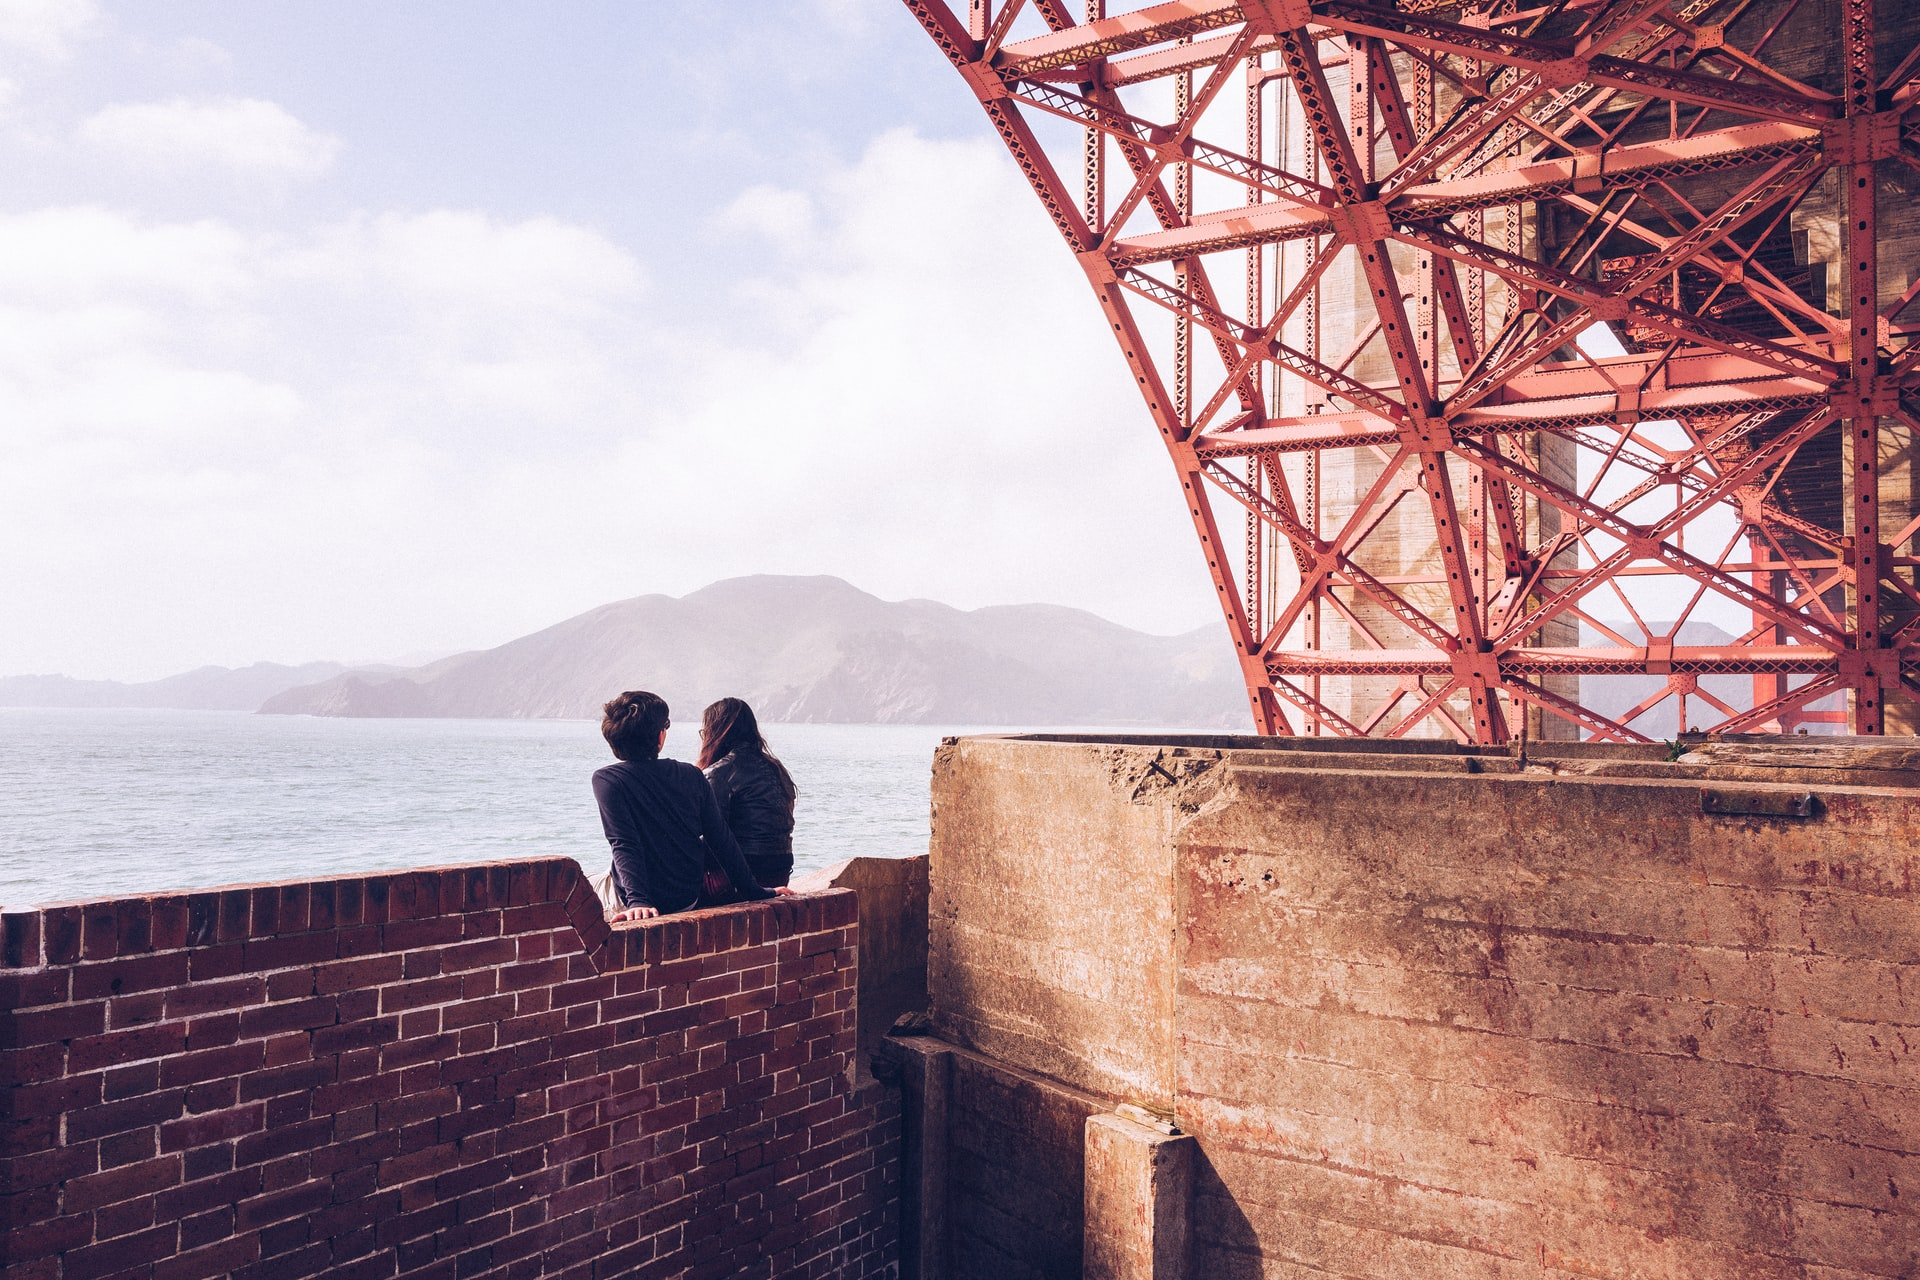 Couple in love in San Francisco near the Golden Gate Bridge